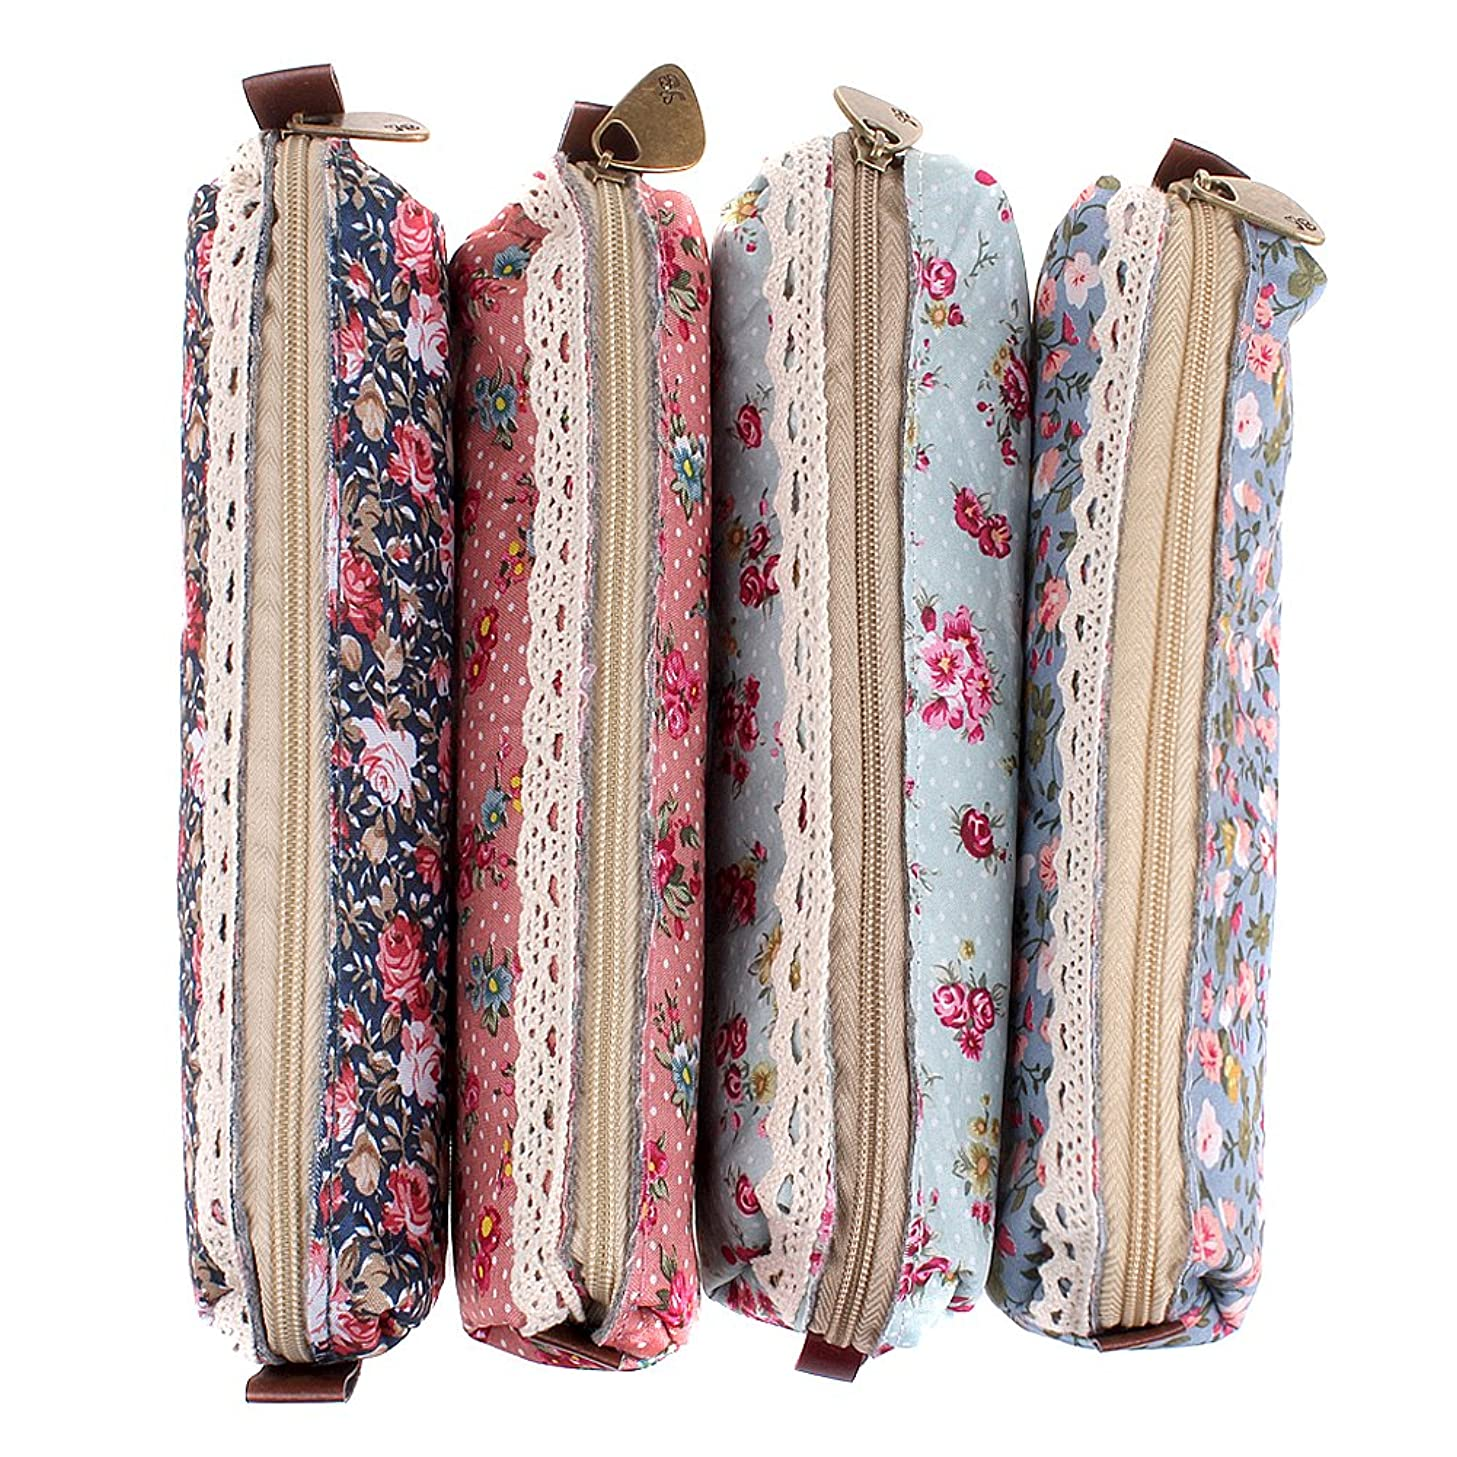 EUBUY Fashion Floral Pattern Korean Style Canvas Pen Bag Coin Purse Key Make Up Pouch Bag Case Pack Of 4